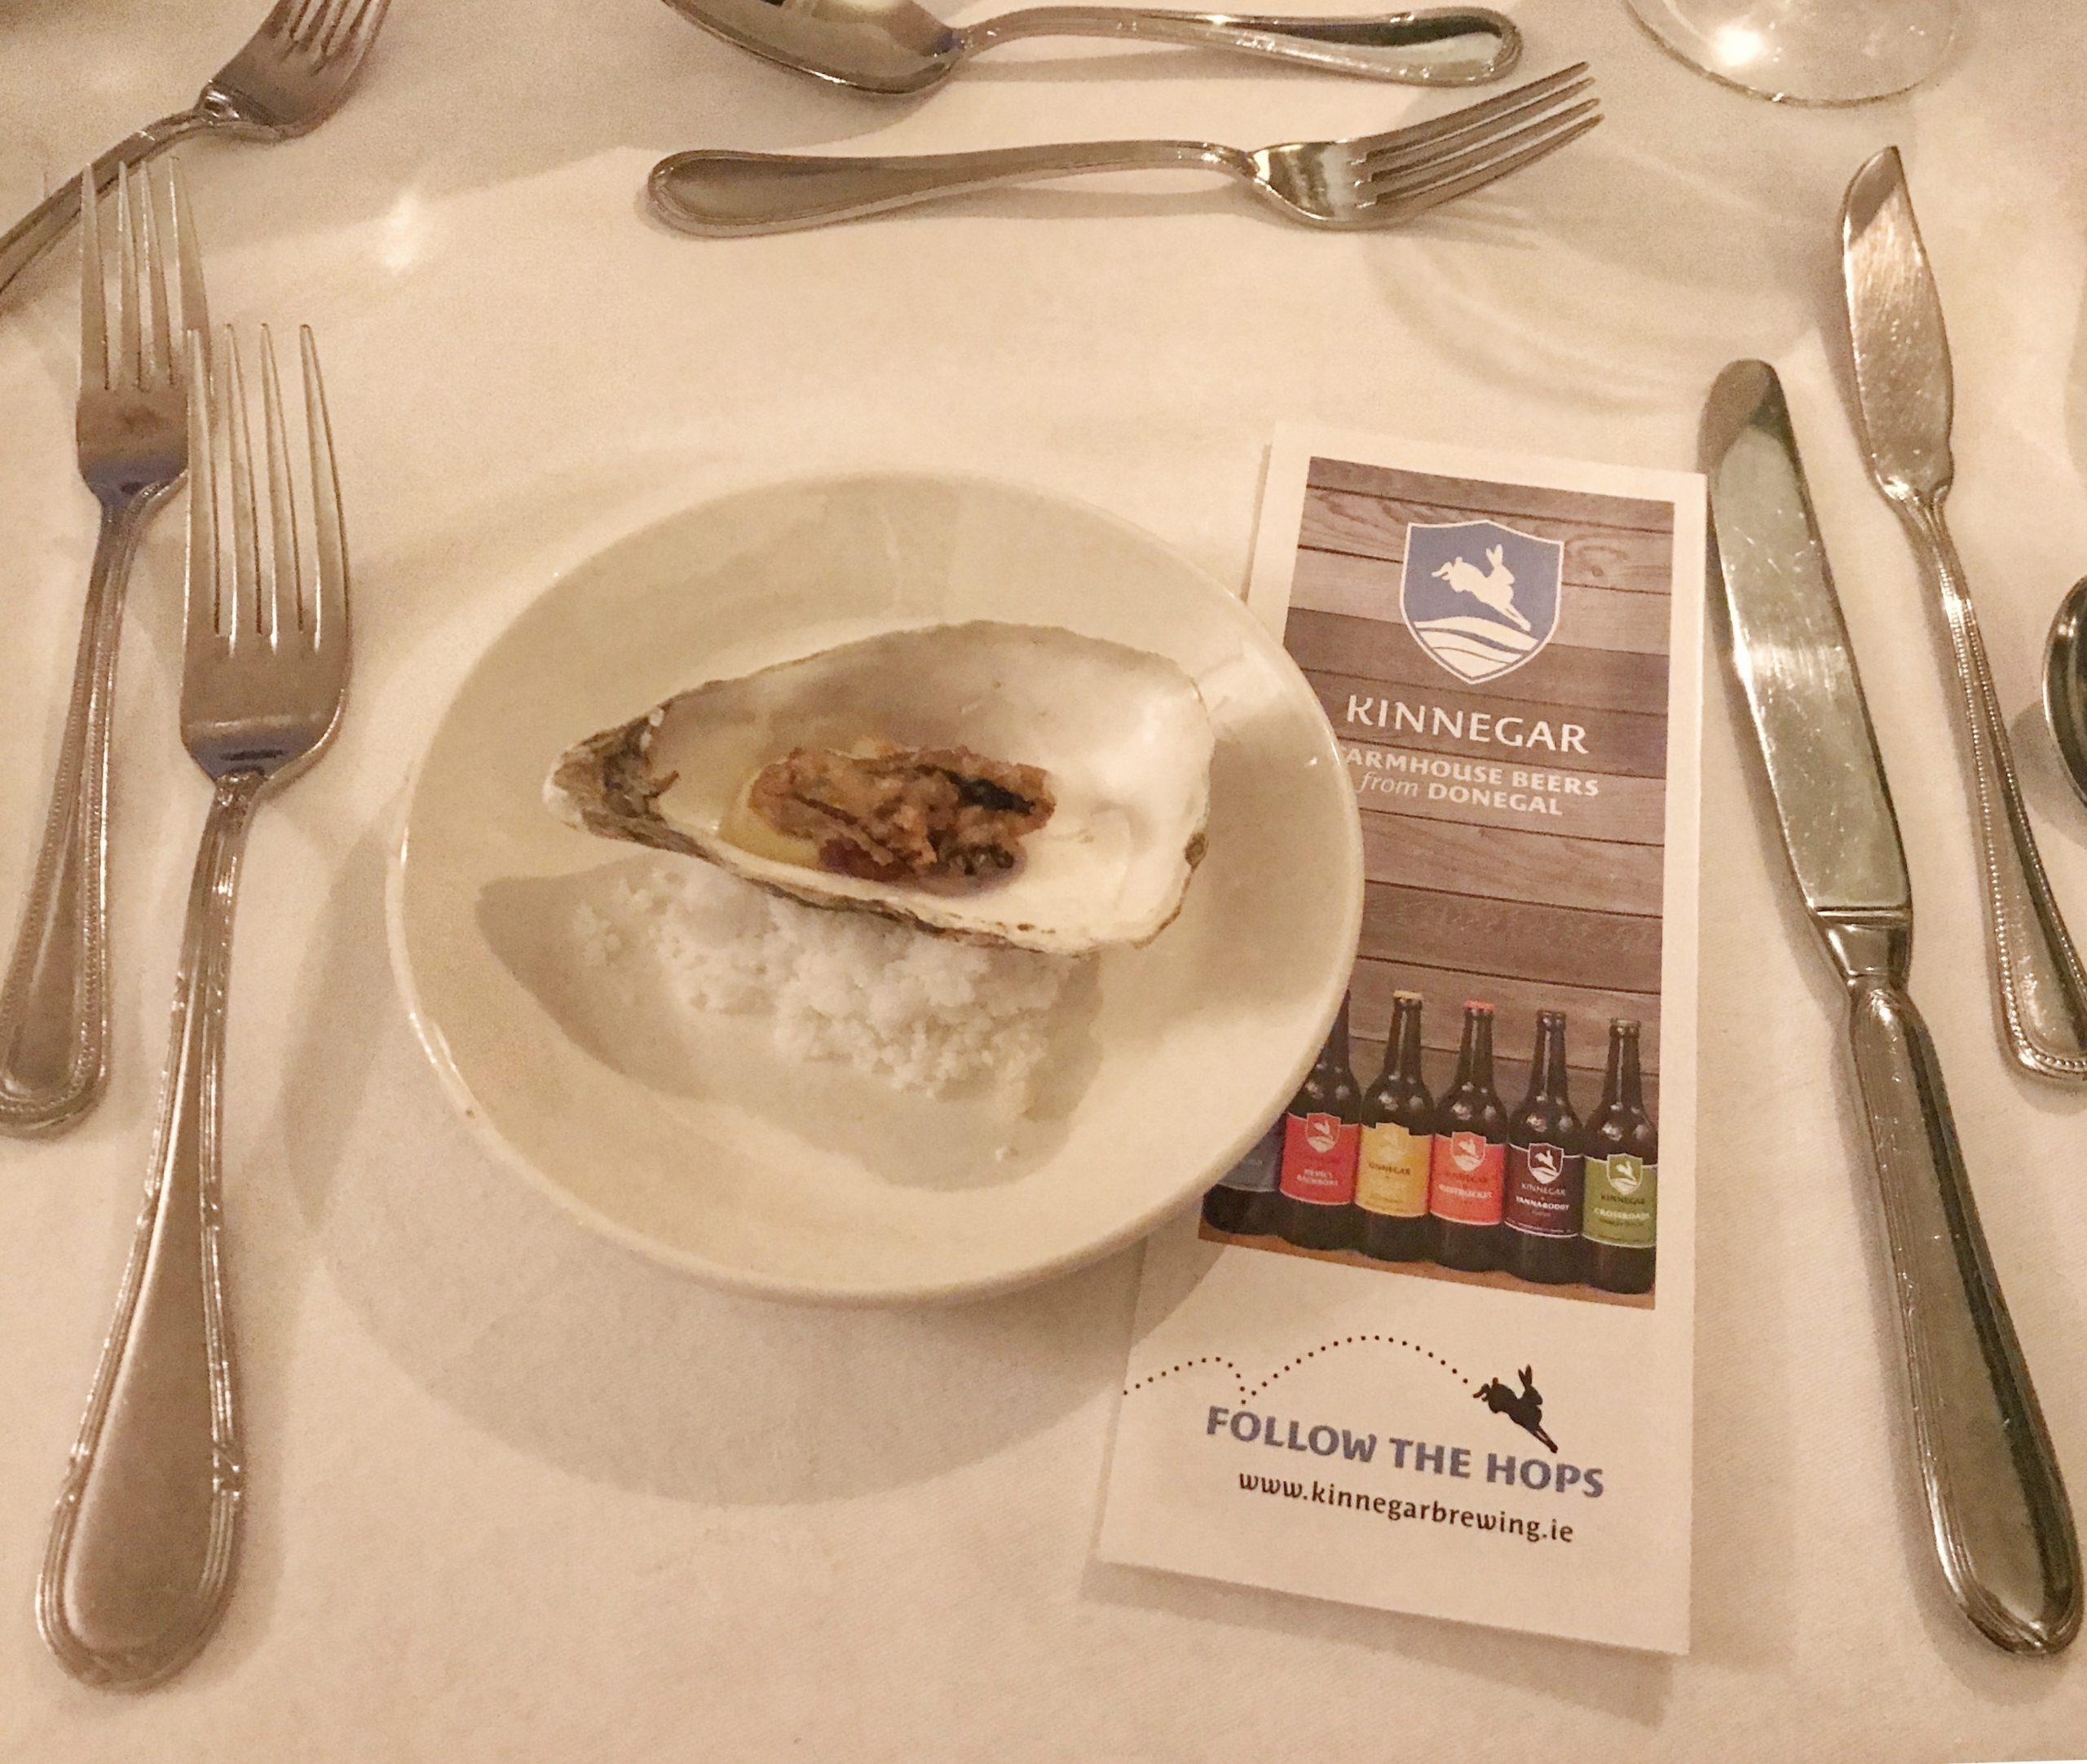 Krumpelnest Beer Battered Oyster with Oyster Emulsion scaled-Donegal Food TOurs